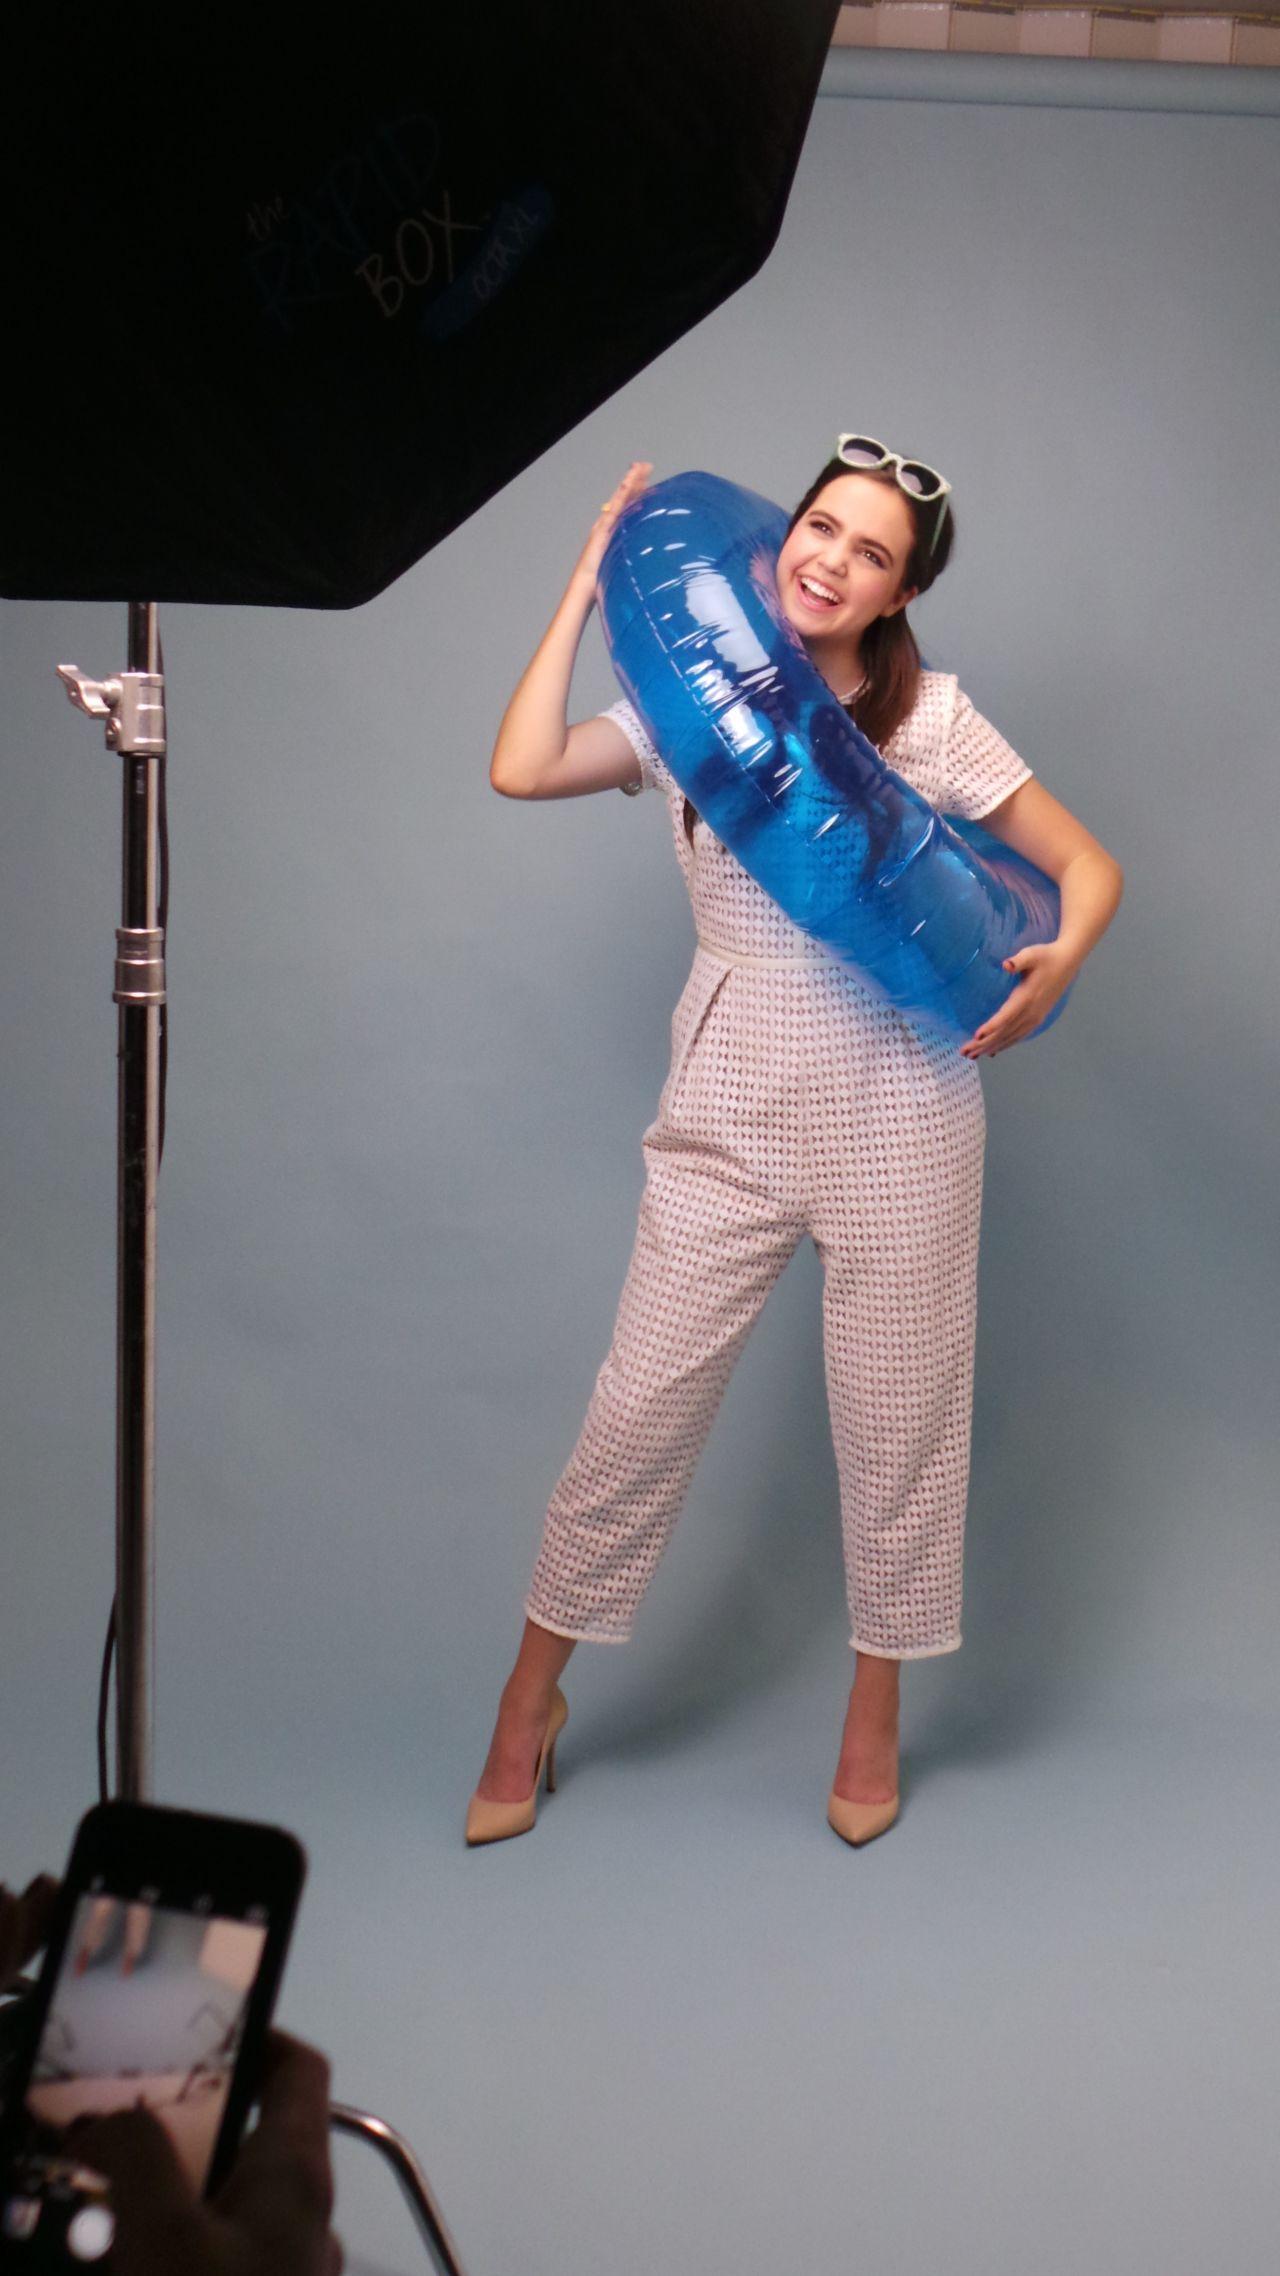 Bailee Madison Photoshoot For Twist Magazine 2016